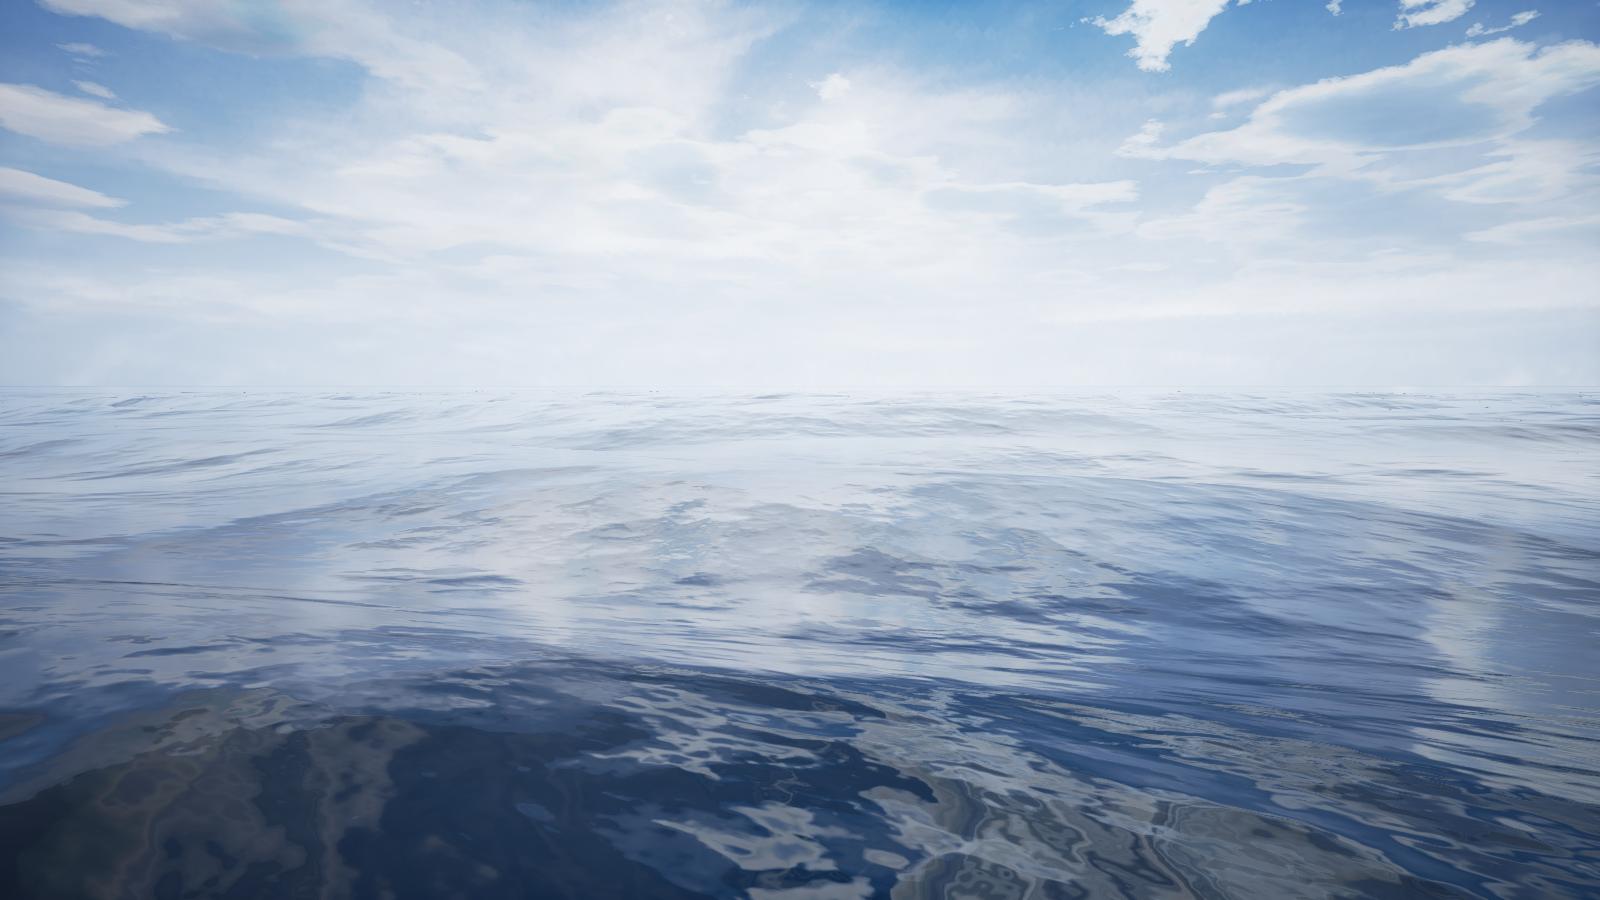 UltraSky_Ocean.png